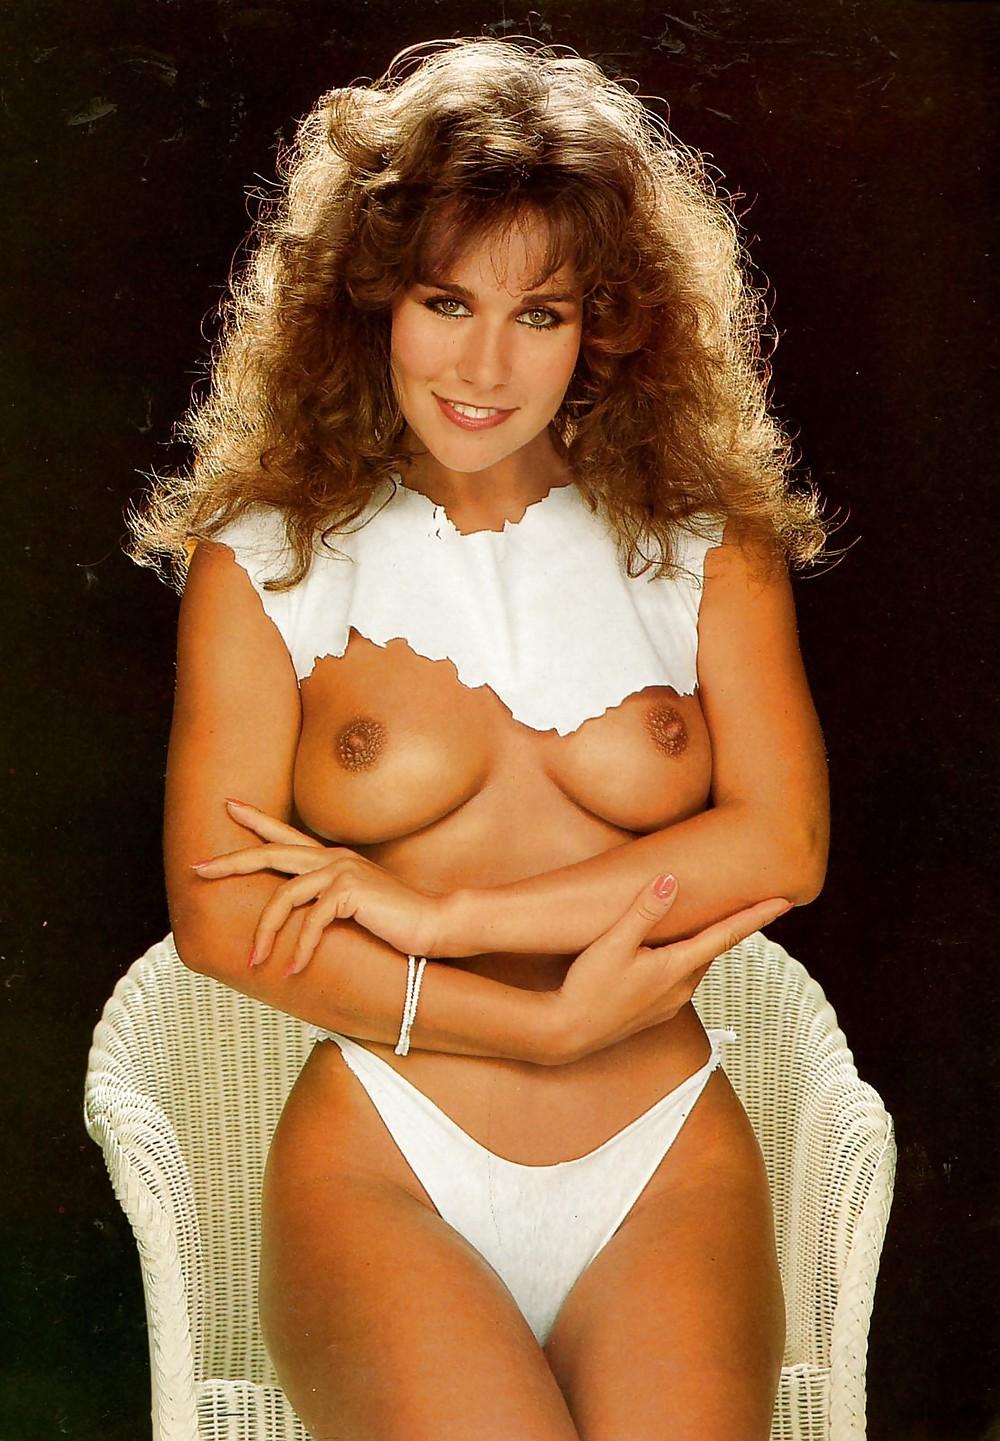 Linda lusardi nude and fucked